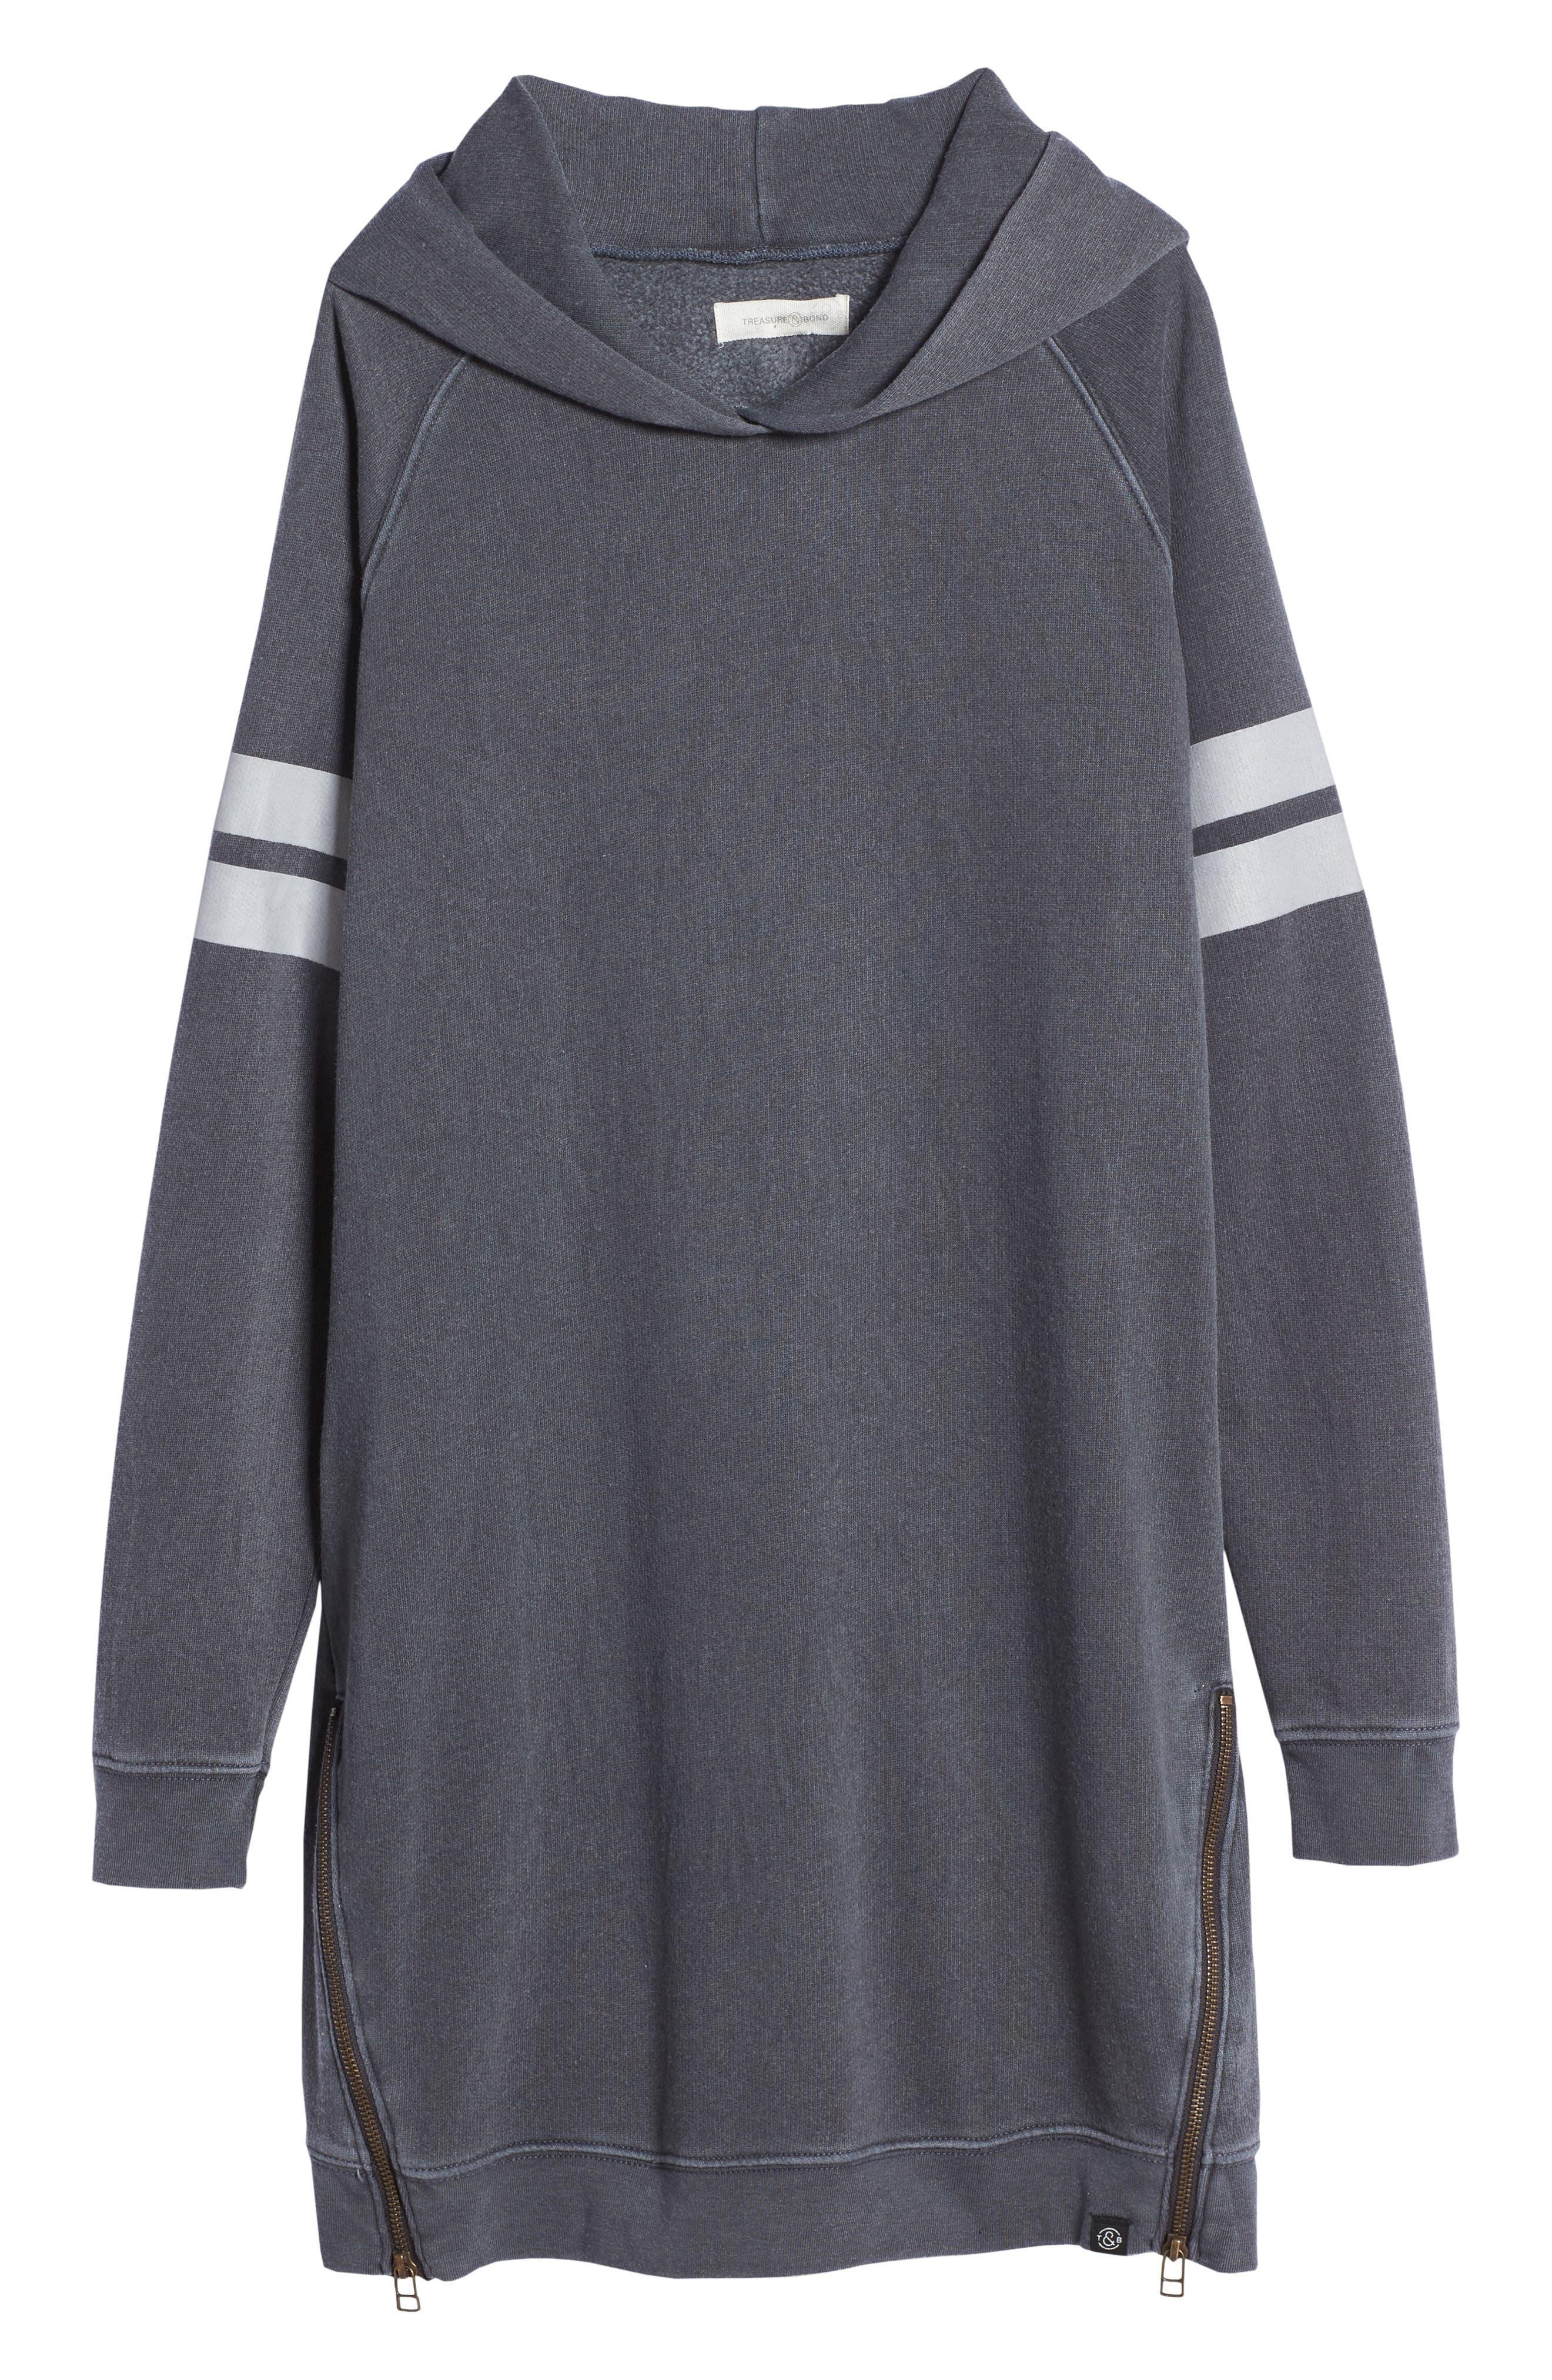 Main Image - Treasure & Bond Hooded Fleece Sweatshirt Dress (Big Girls)